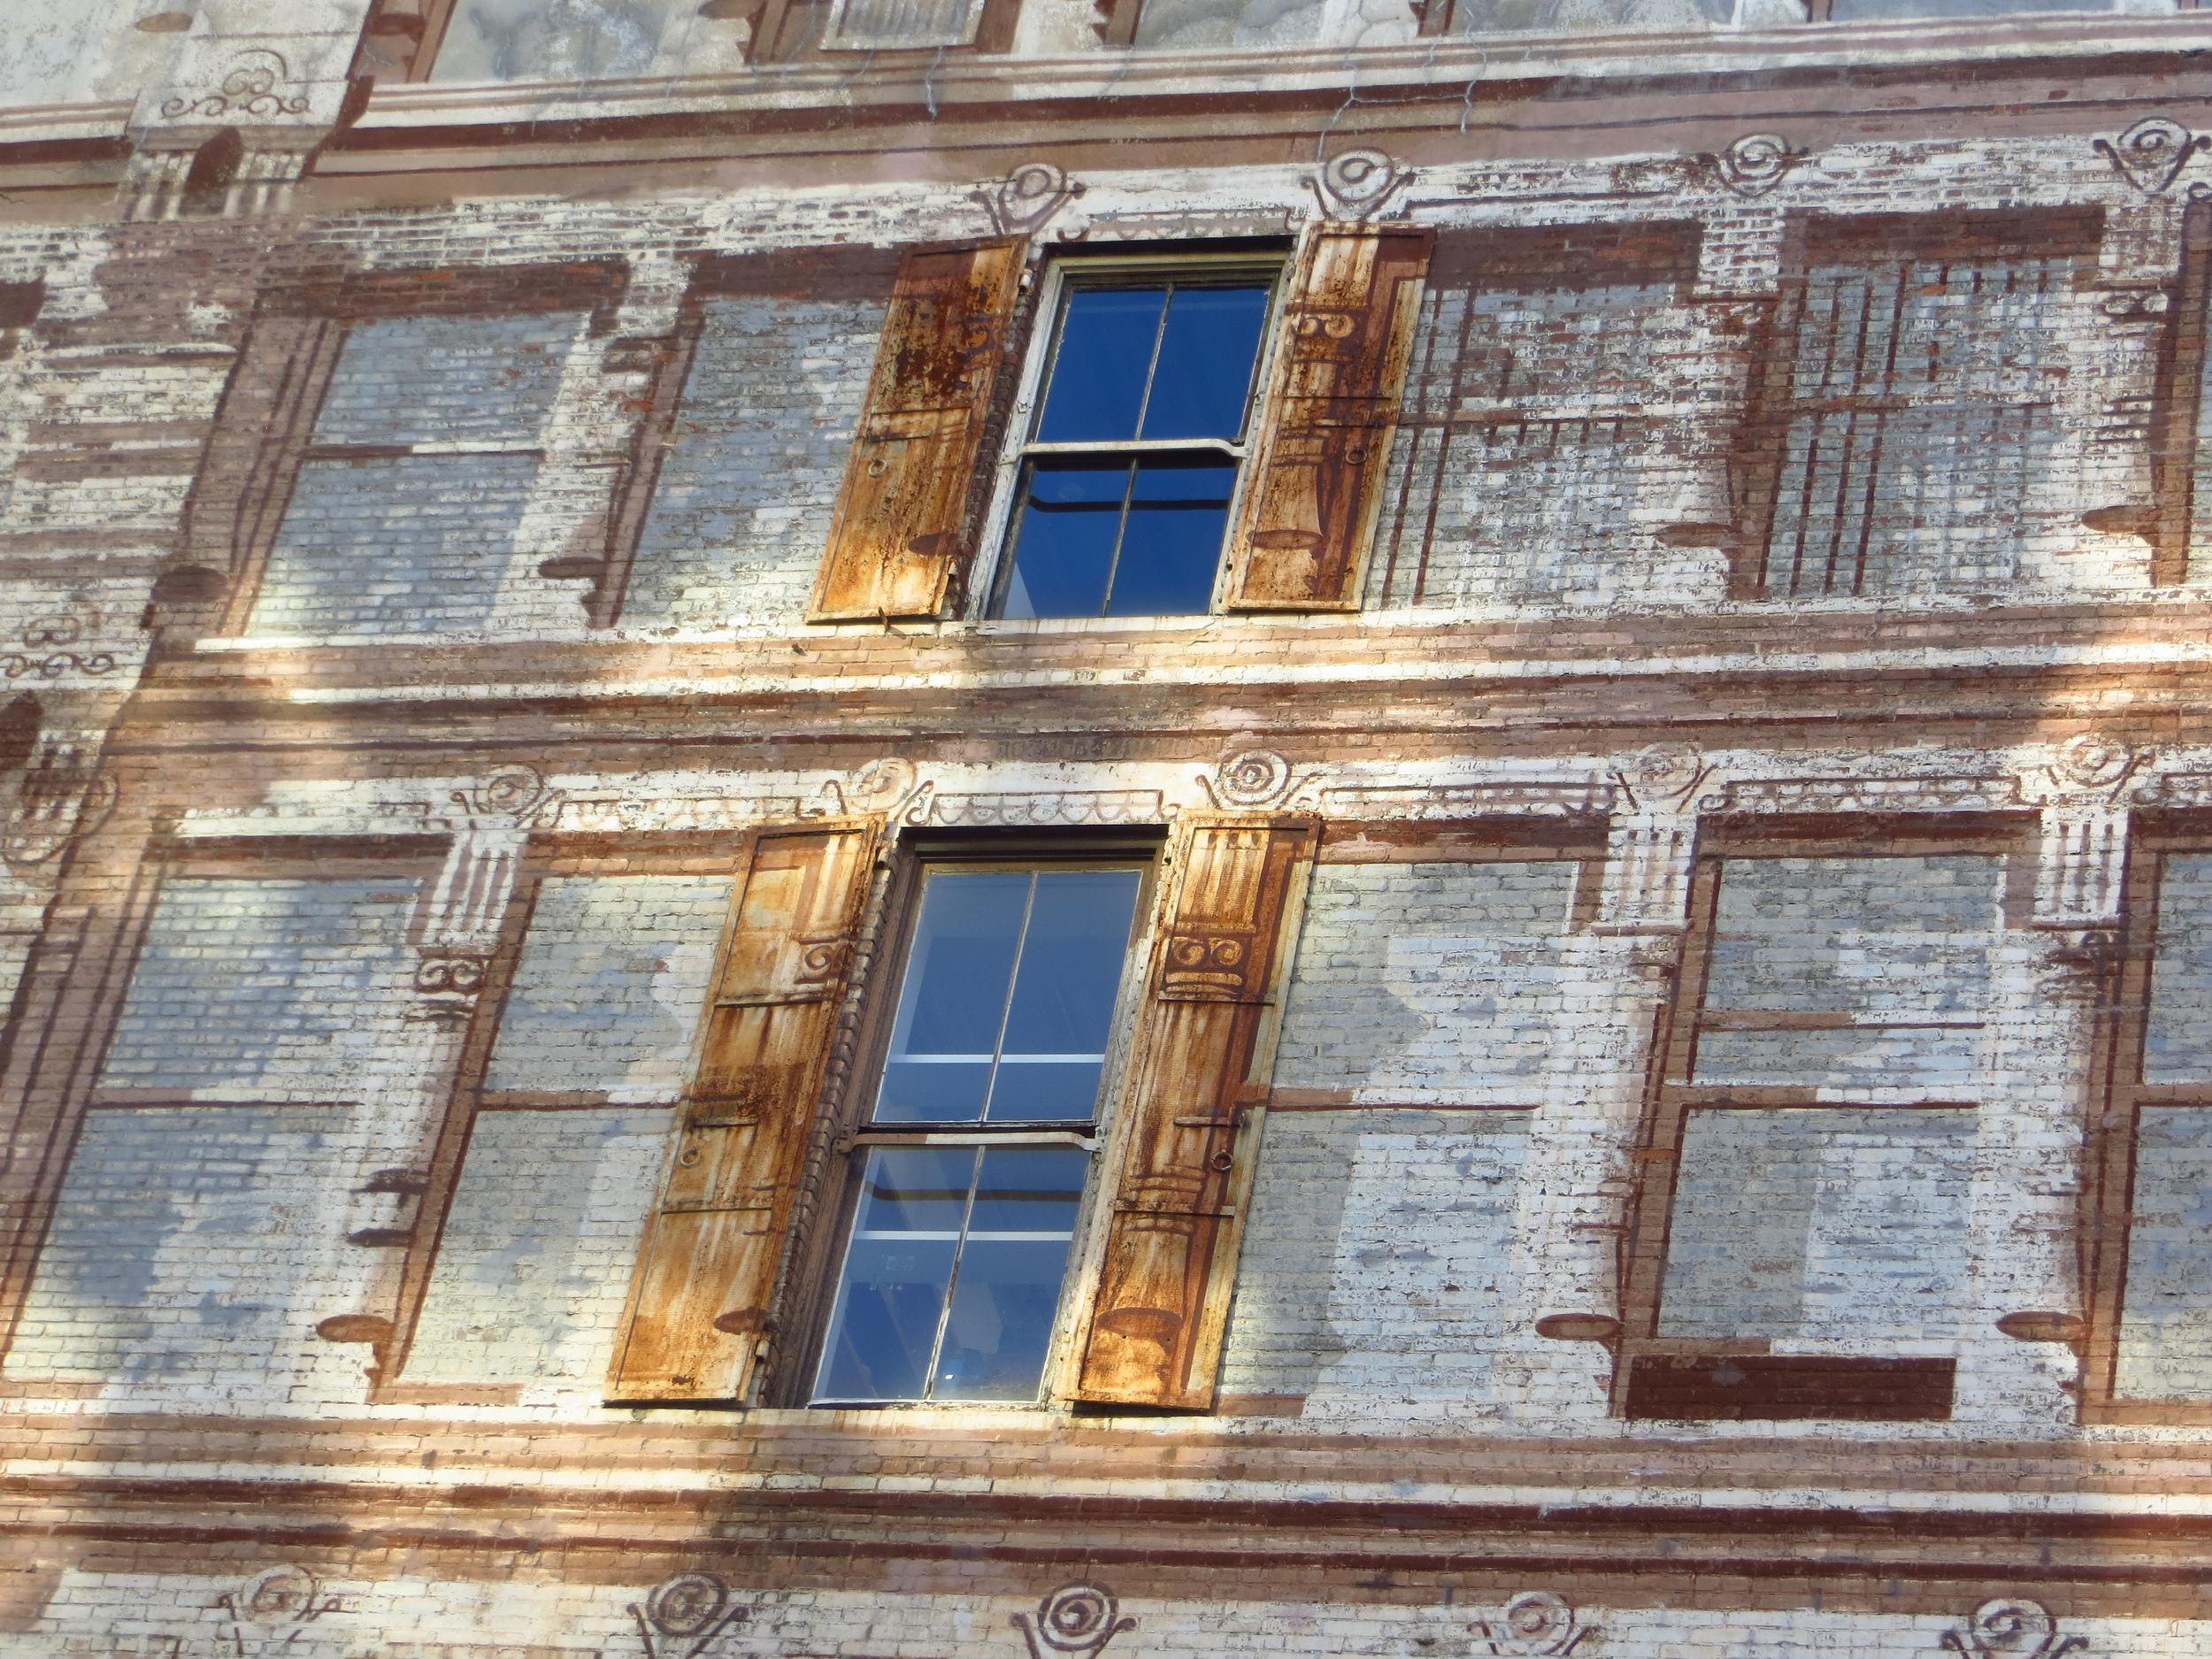 Windows, real and fake